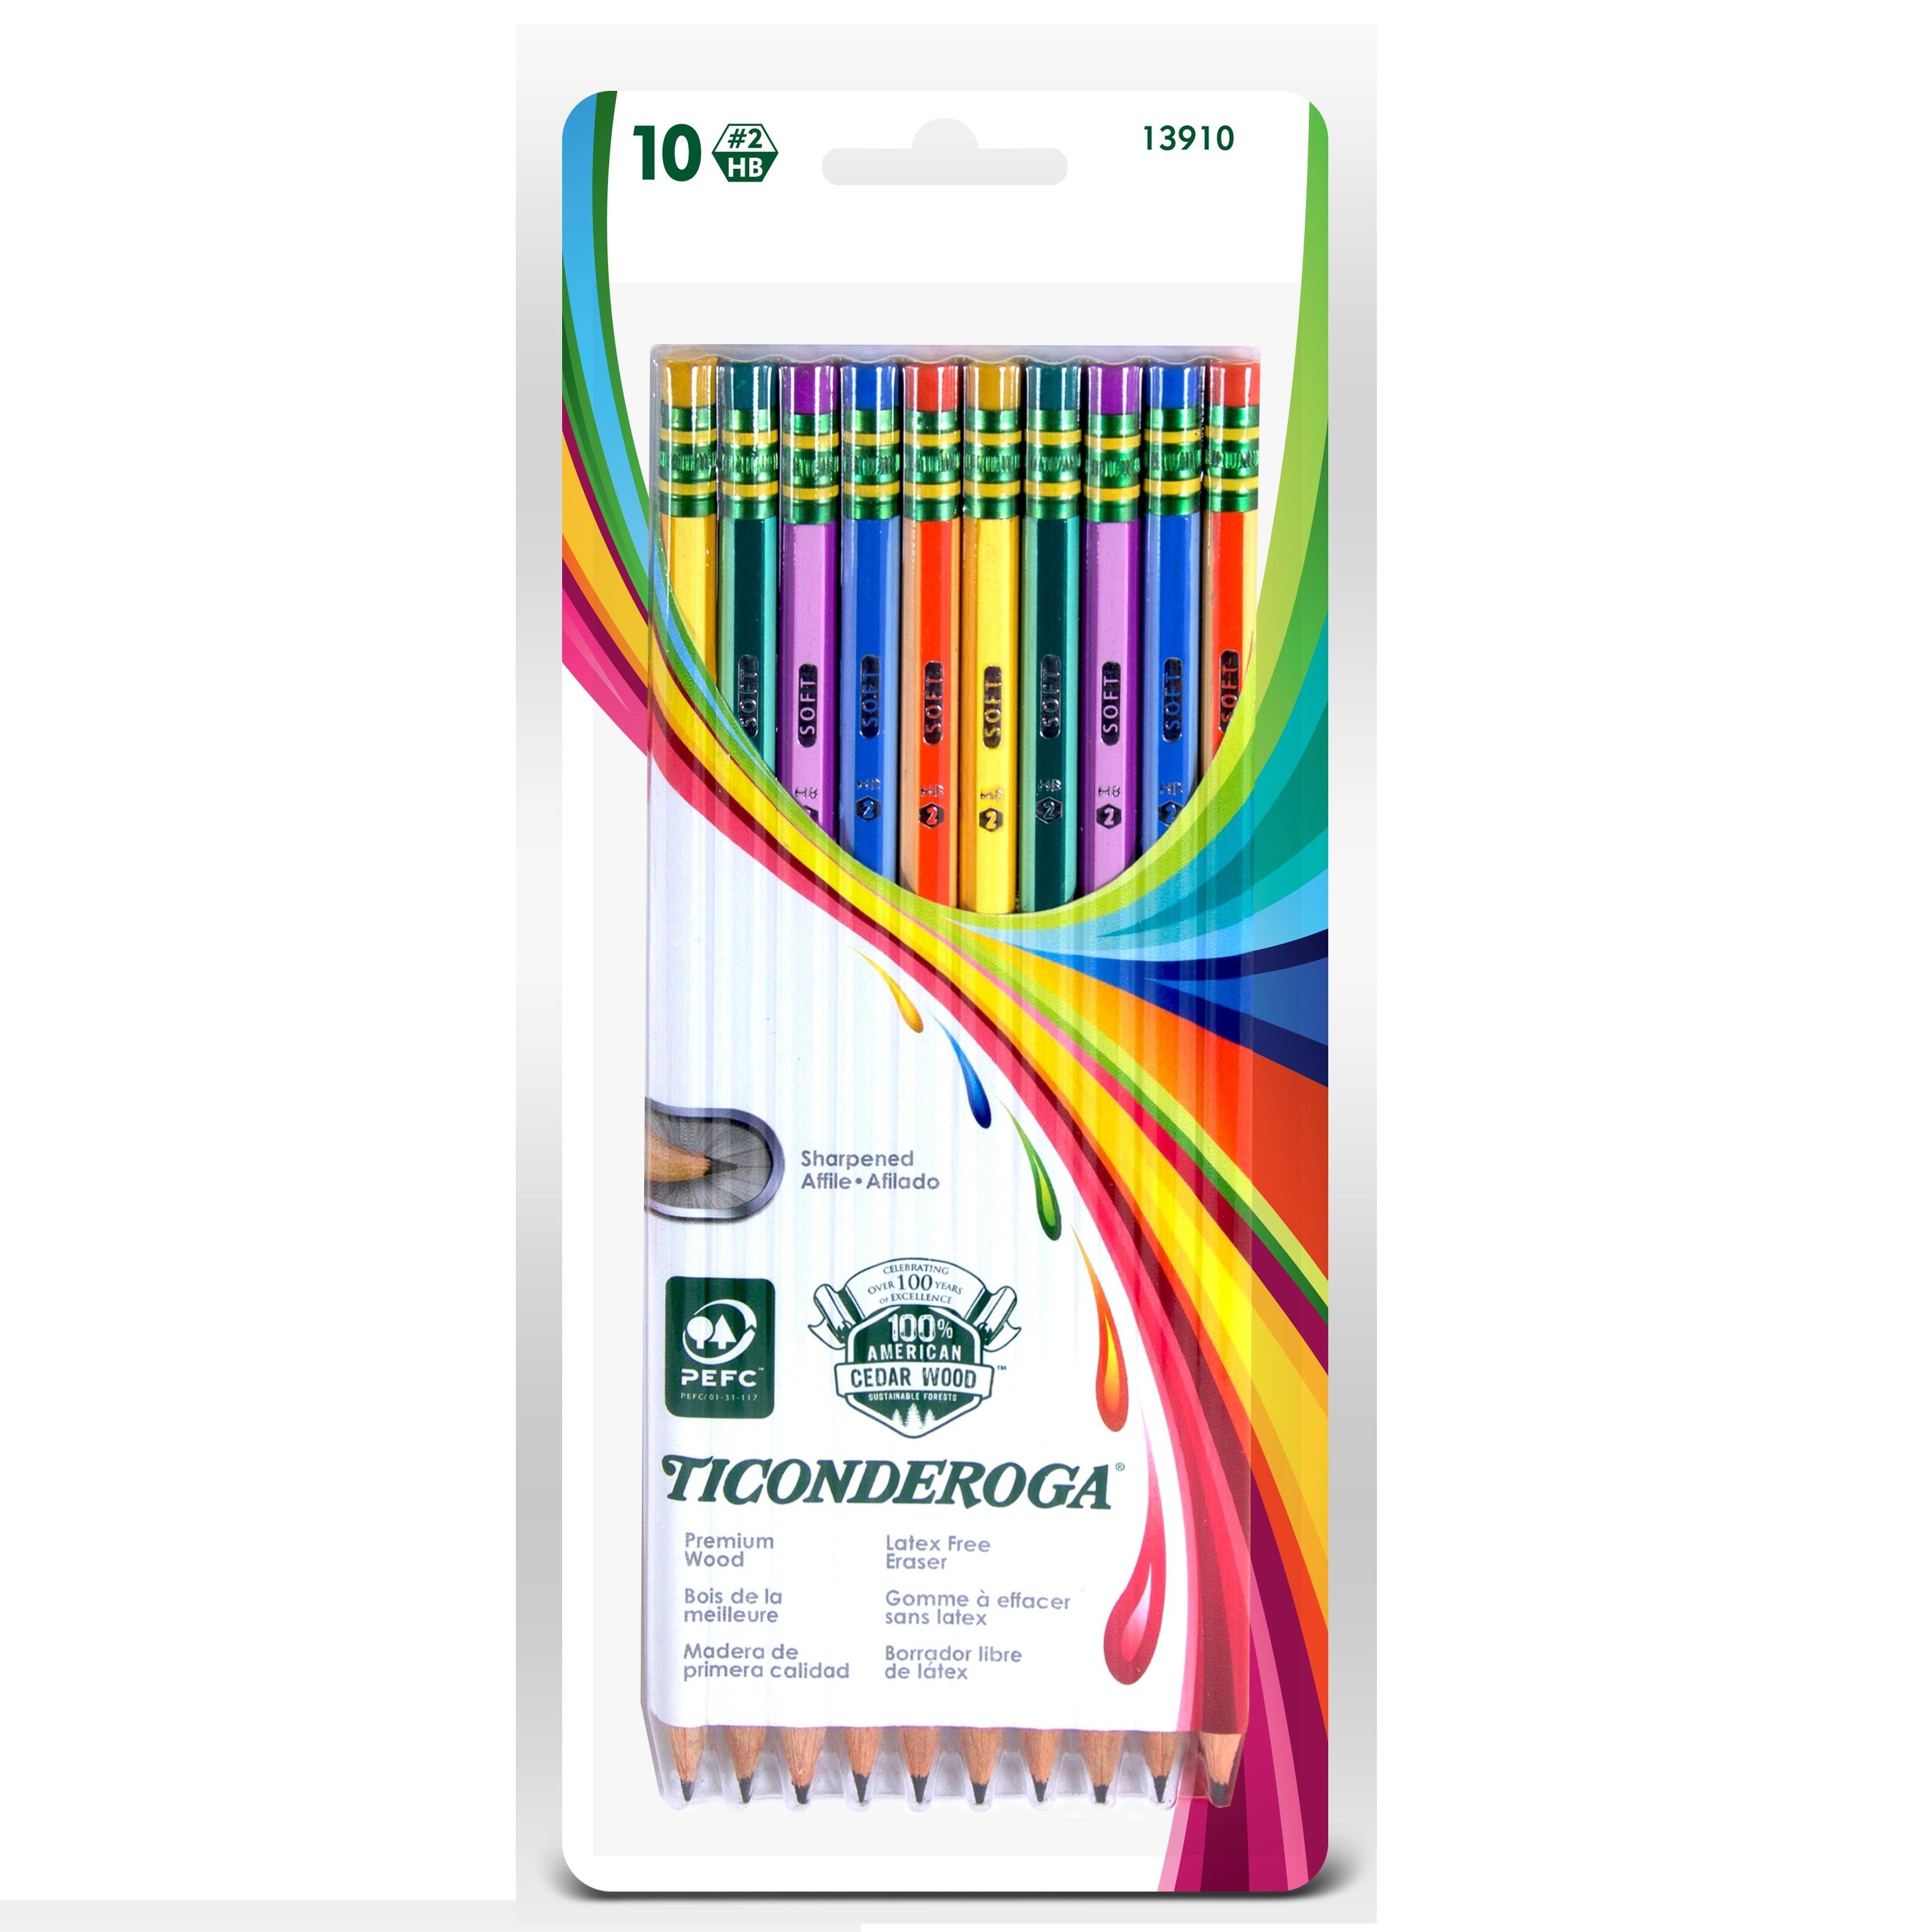 Ticonderoga No. 2 Striped Pencils